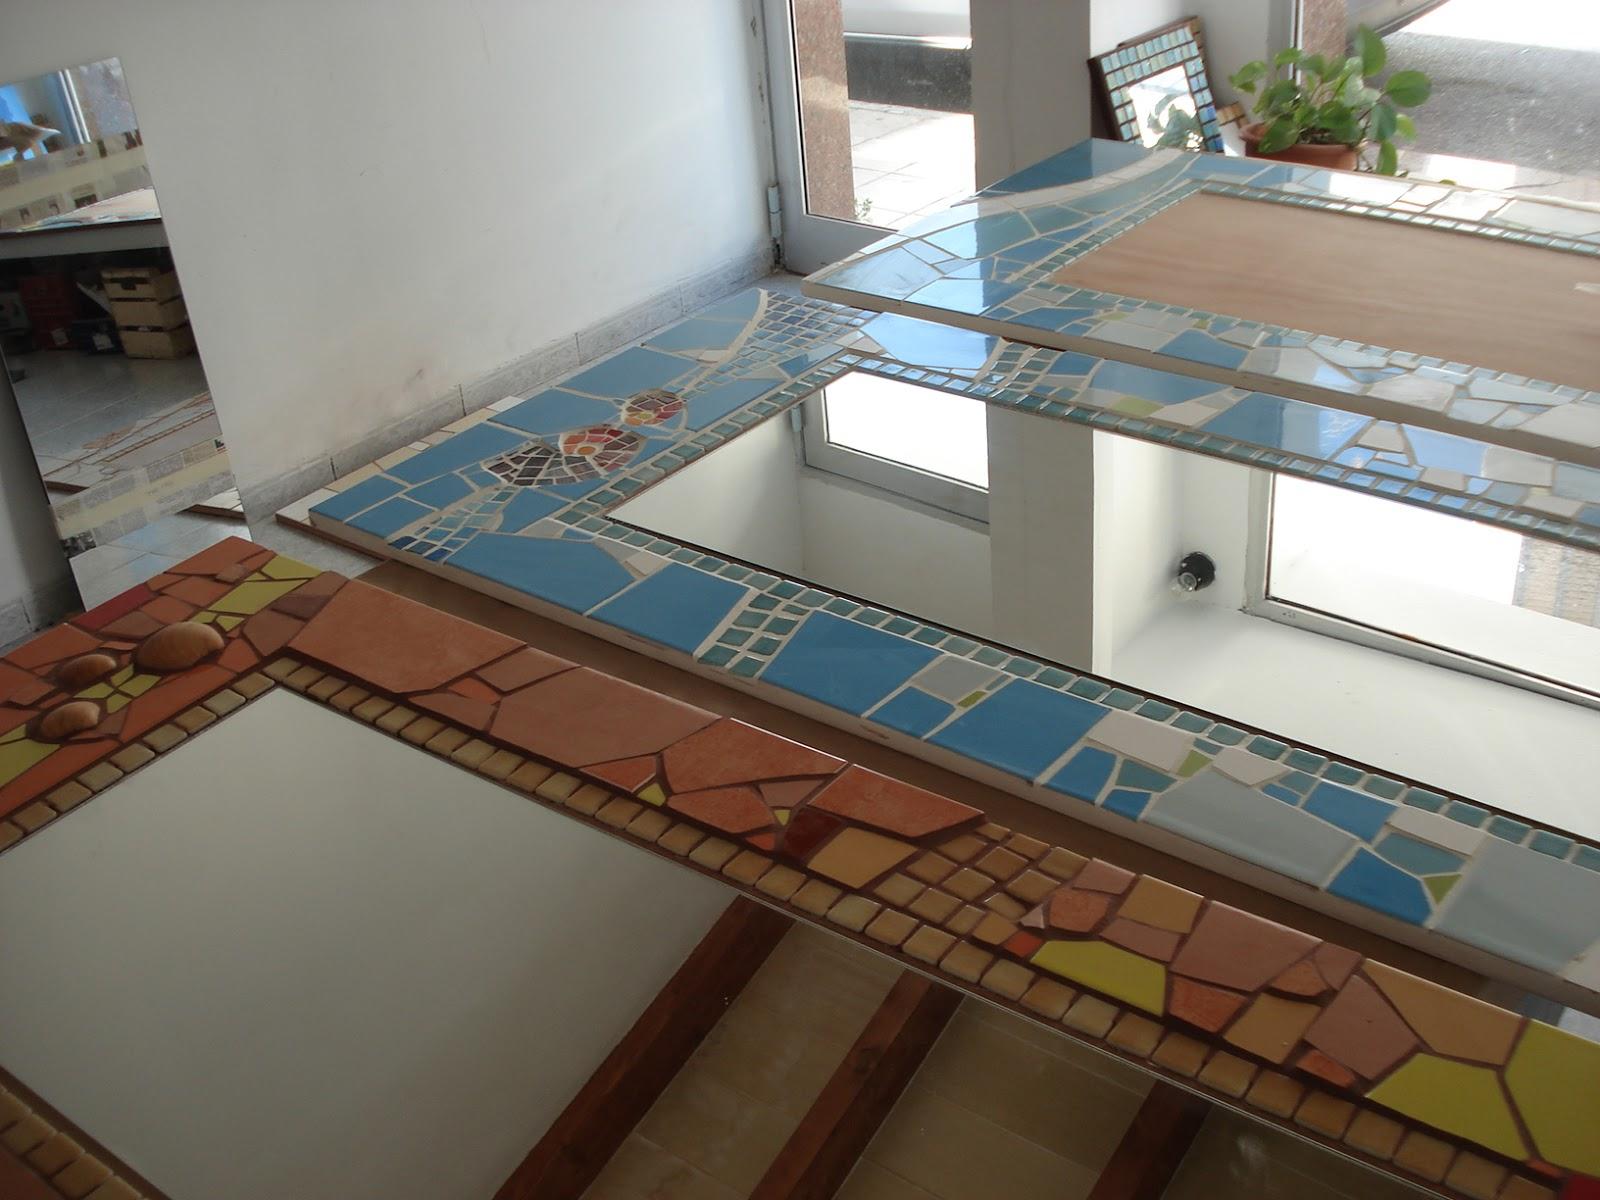 Mosaicos mallorca espejos de mosaico para el hostal for Mosaicos para espejos